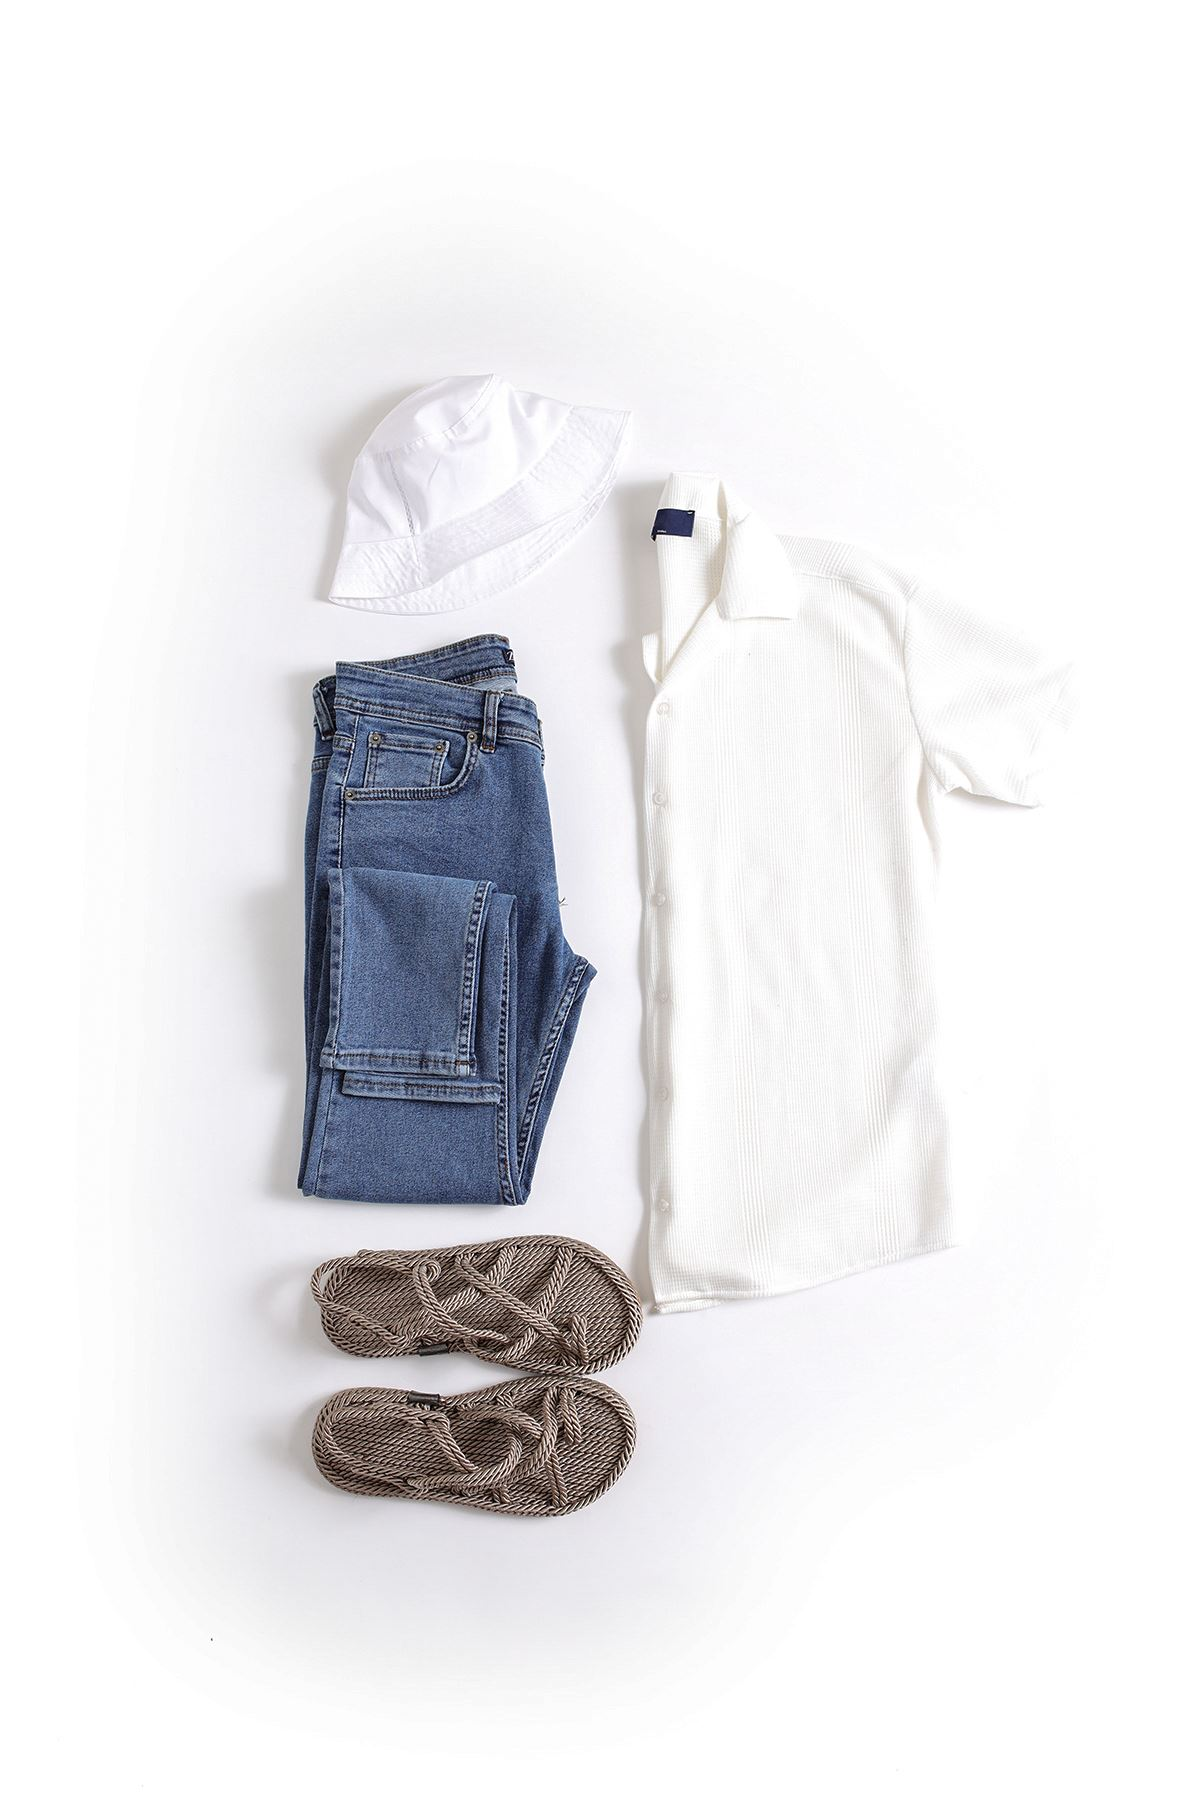 Beyaz Triko Gömlek Mavi Skinny Kot Kombin